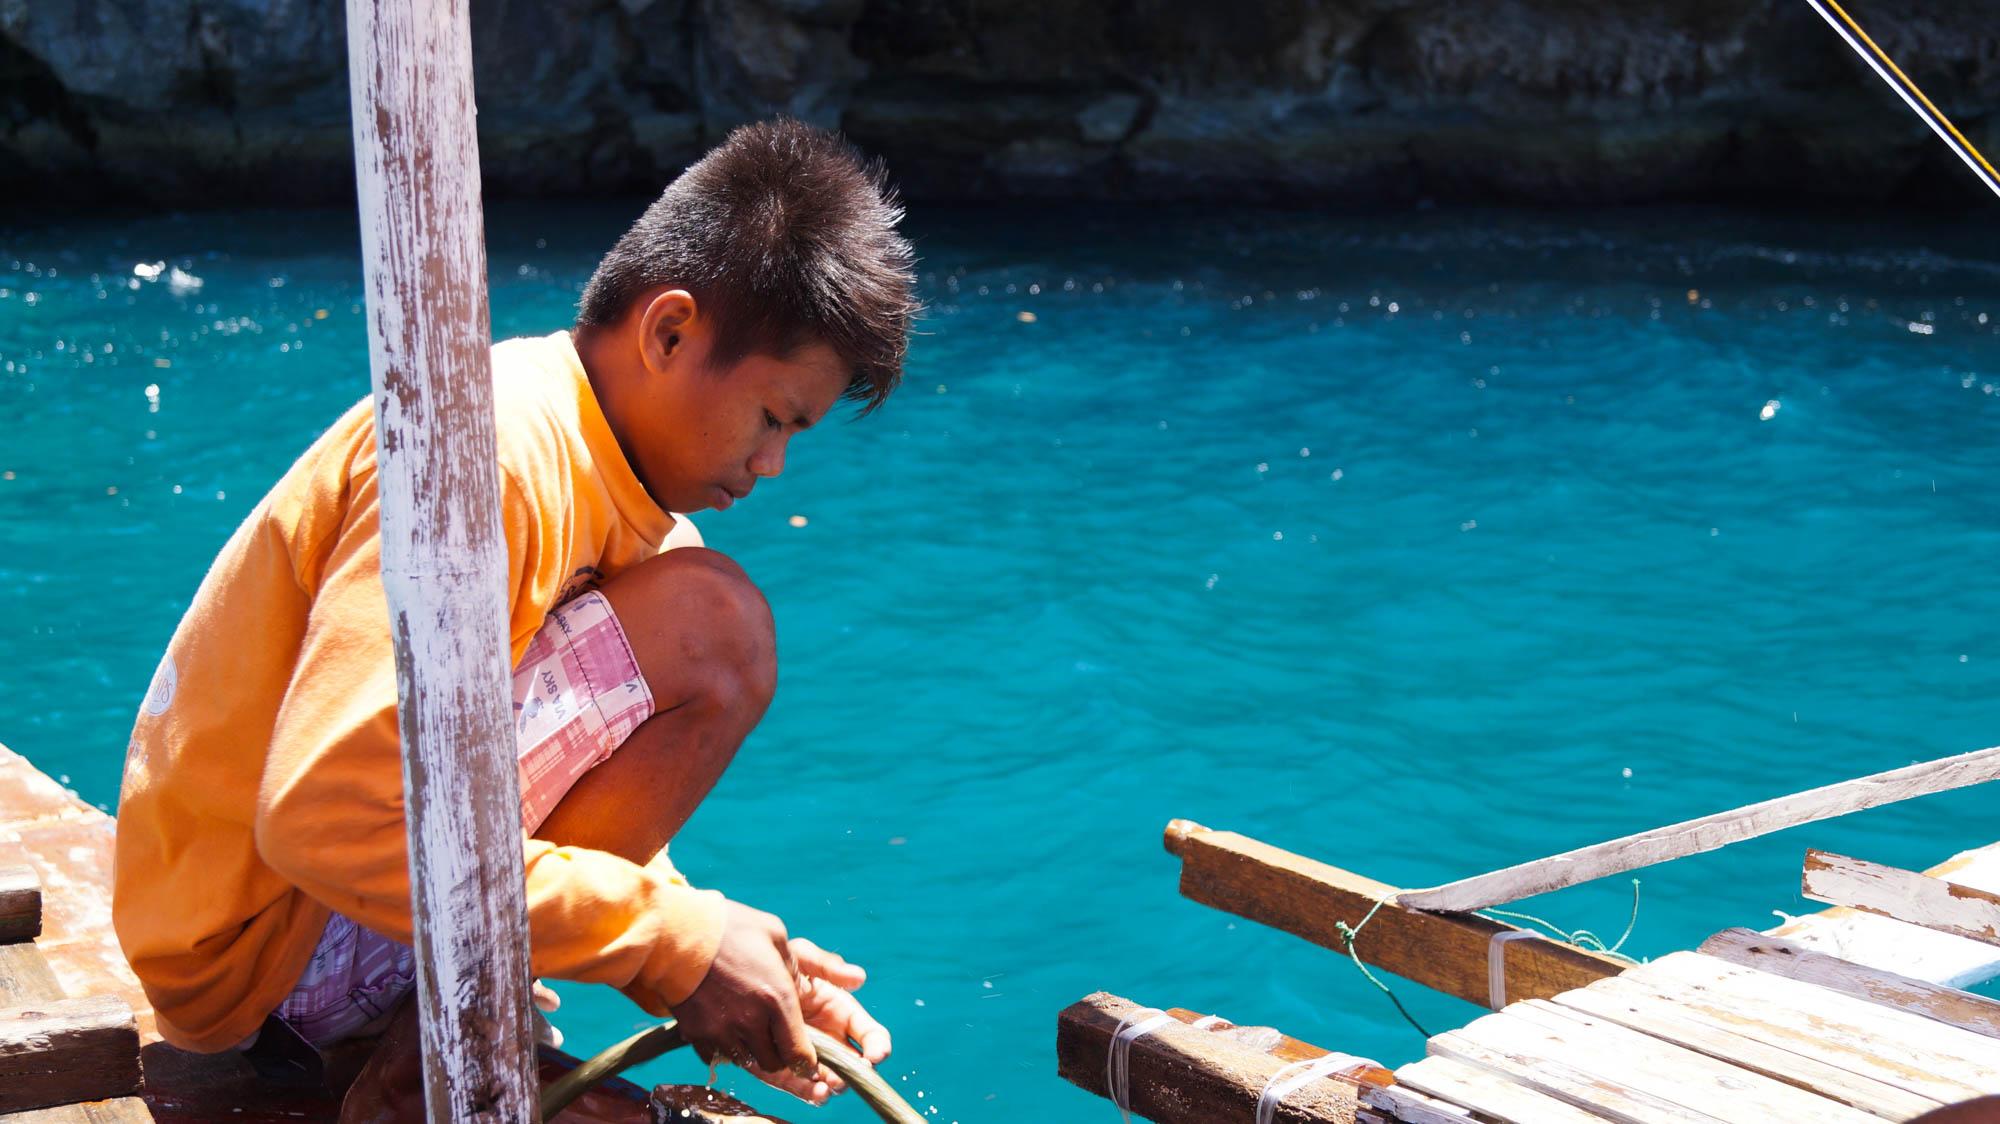 "Islas de Gigantes - bangka上的当地孩子-菲律宾-照明beplay3体育官方下载"">              </noscript>              <img class="